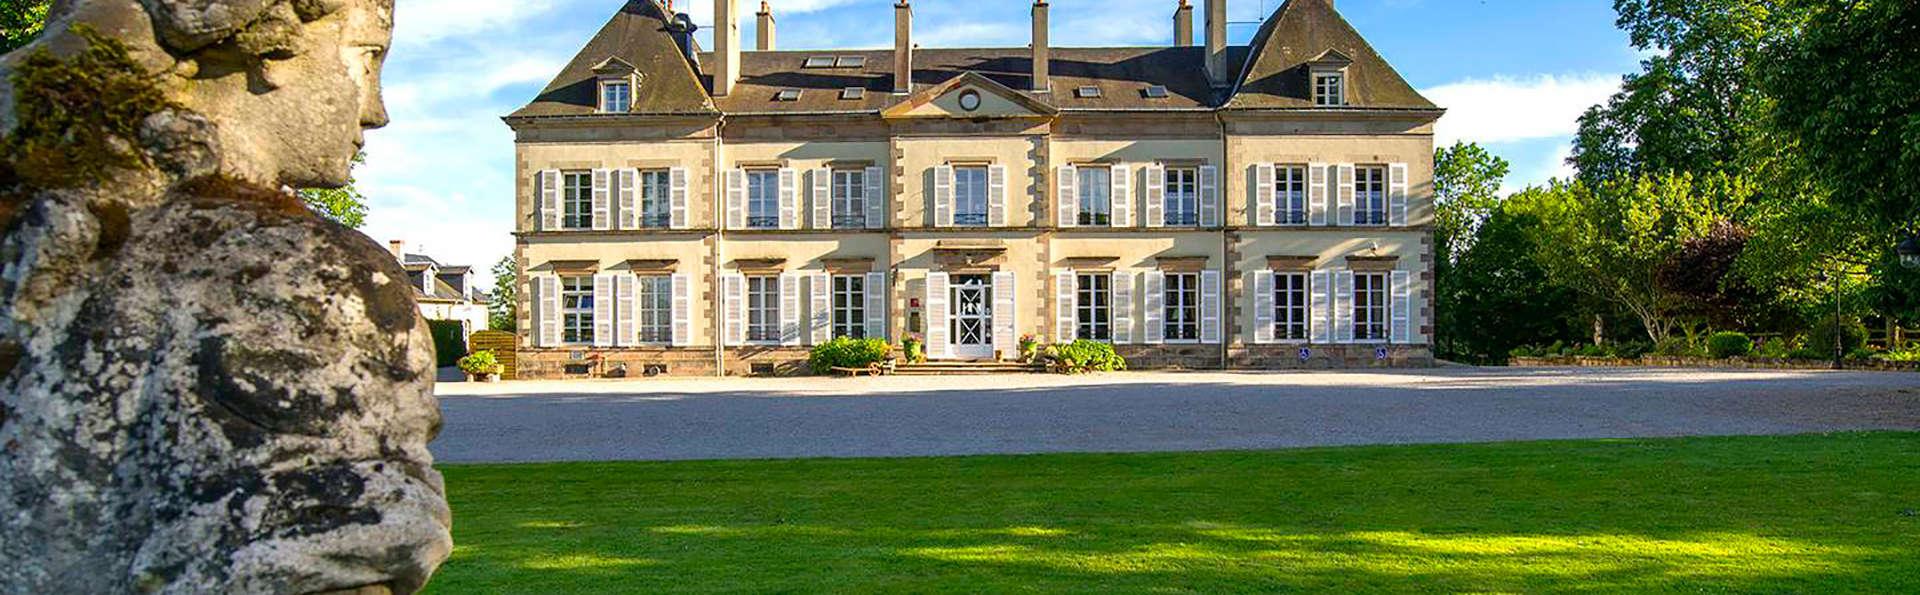 Château d'Ygrande  - EDIT_front1.jpg